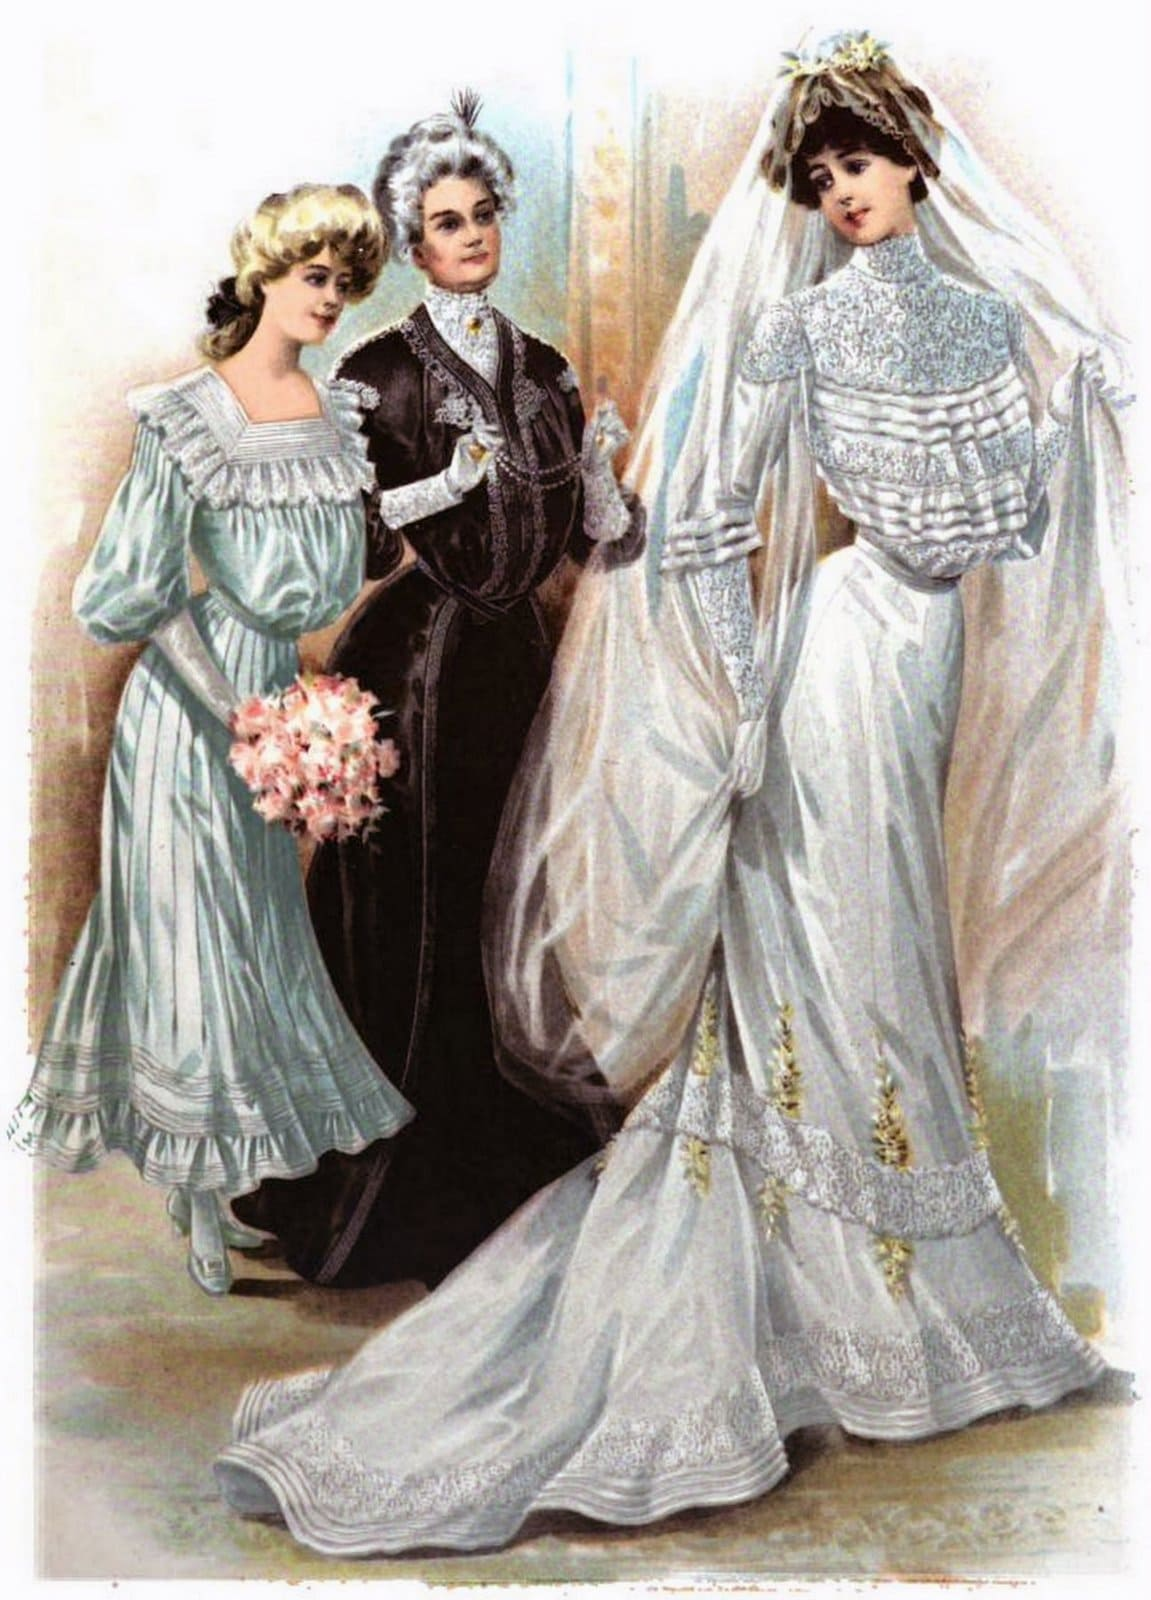 Vintage wedding dress from 1902